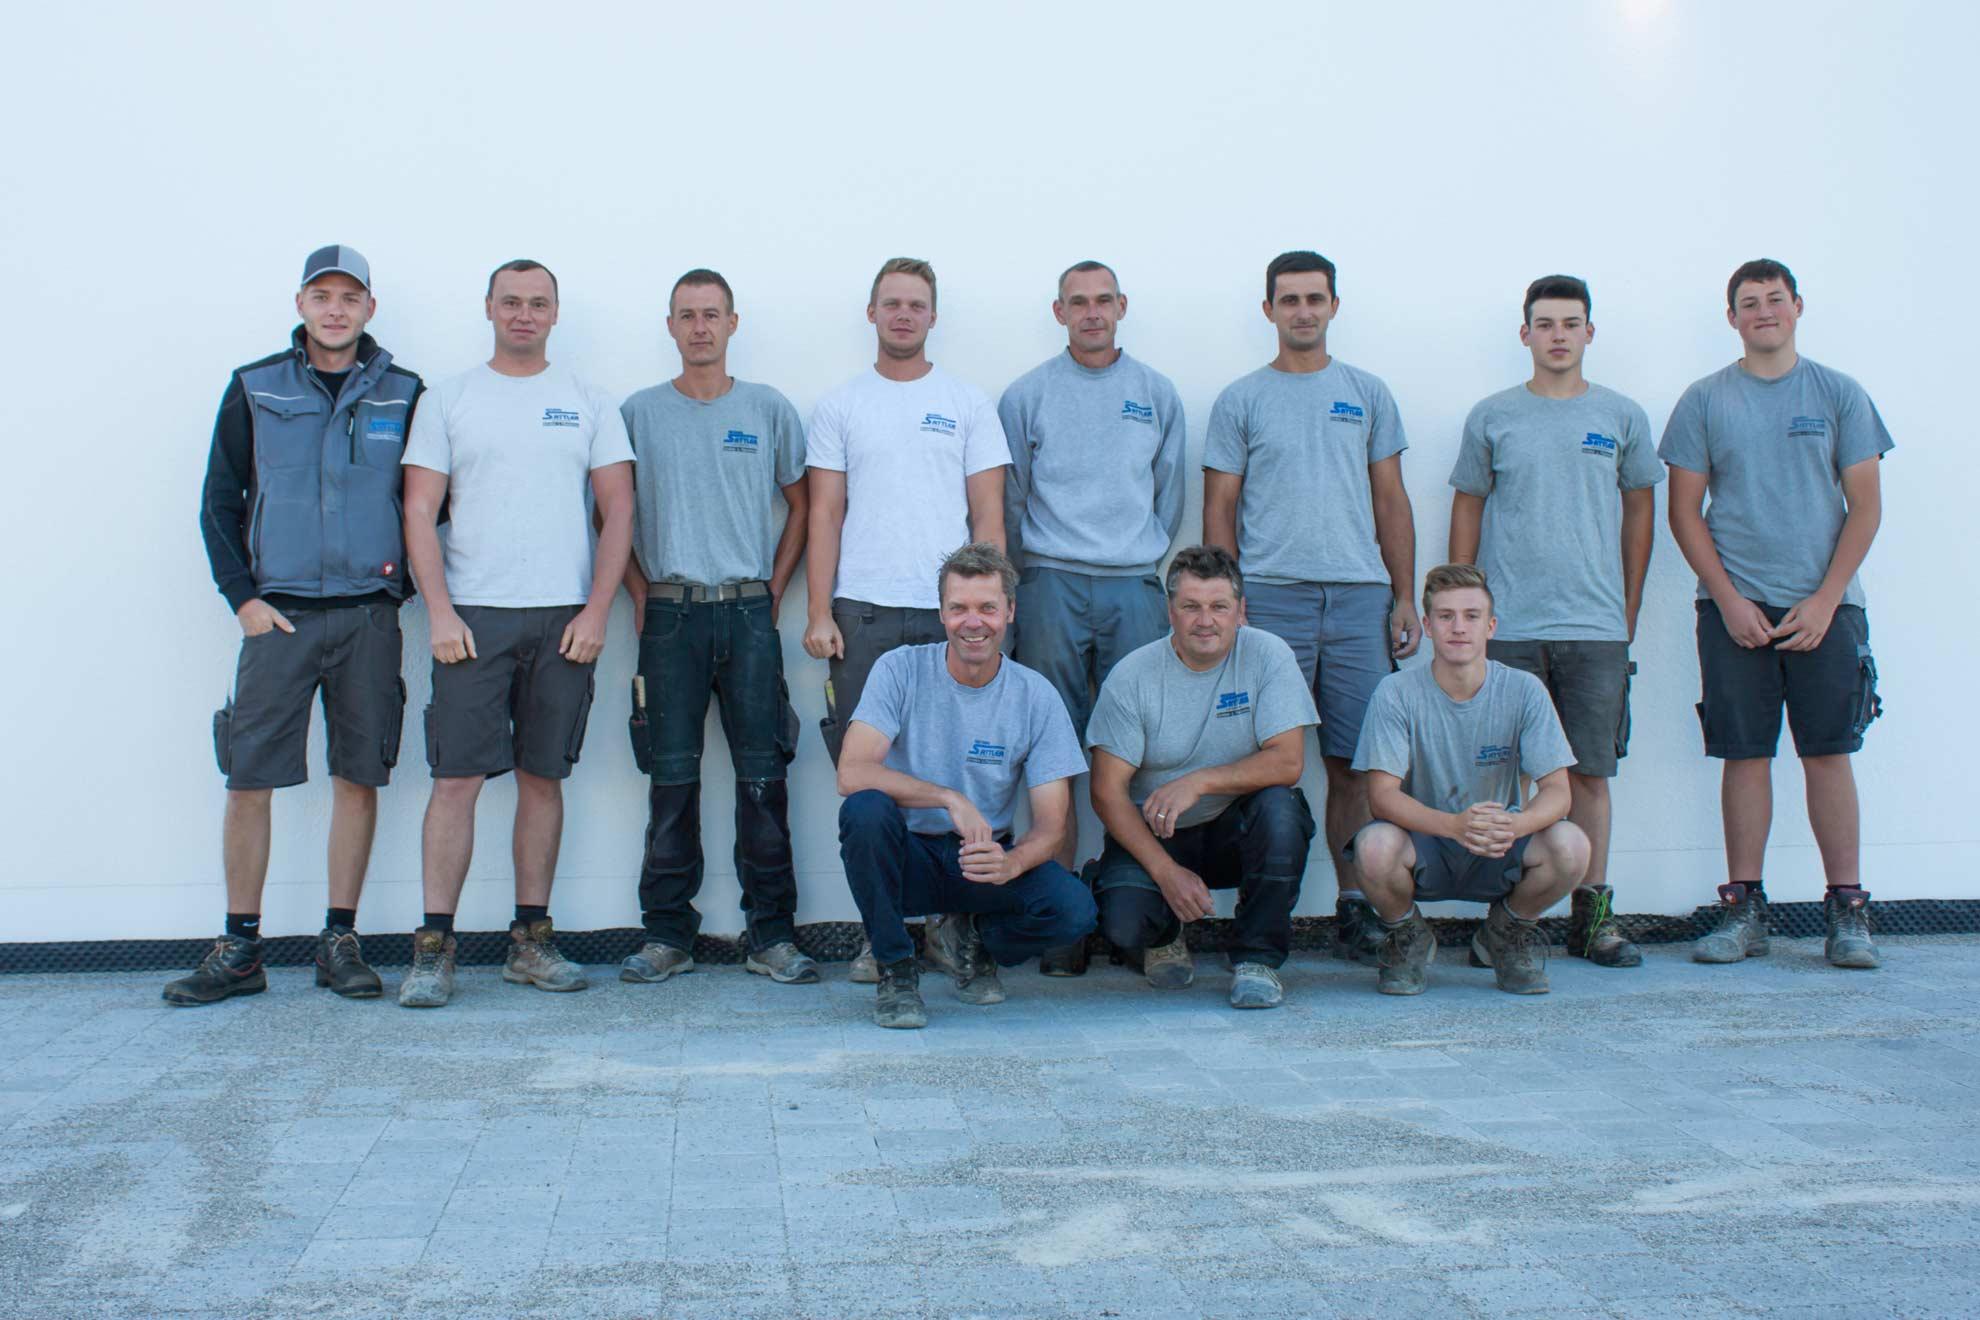 Team Michael Sattler GmbH